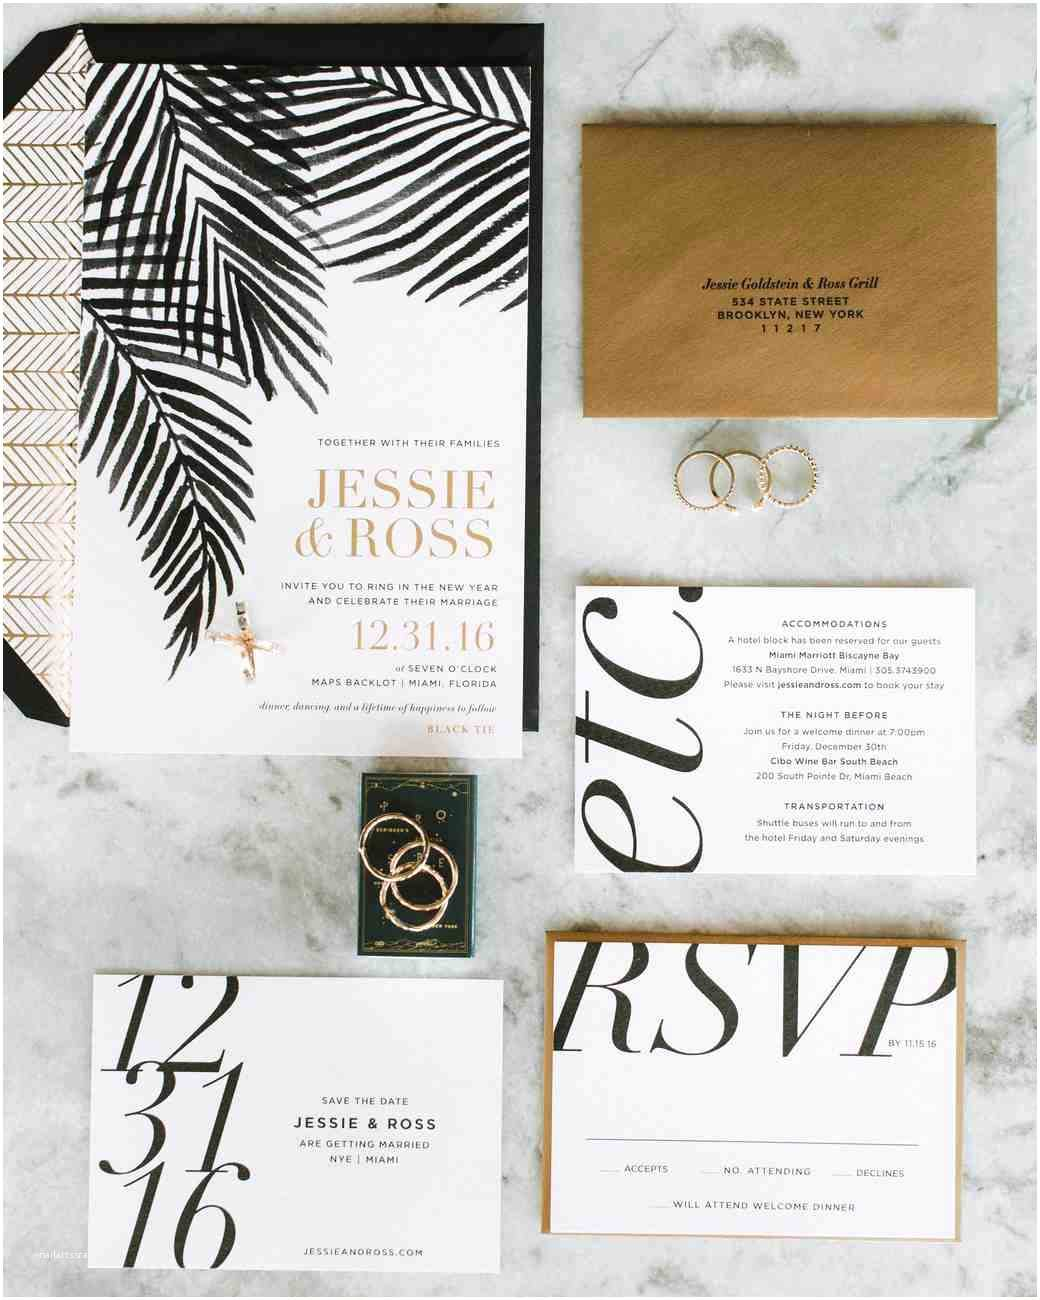 Wedding Invitation Slideshows Free 30 Modern Wedding Invitations We Love